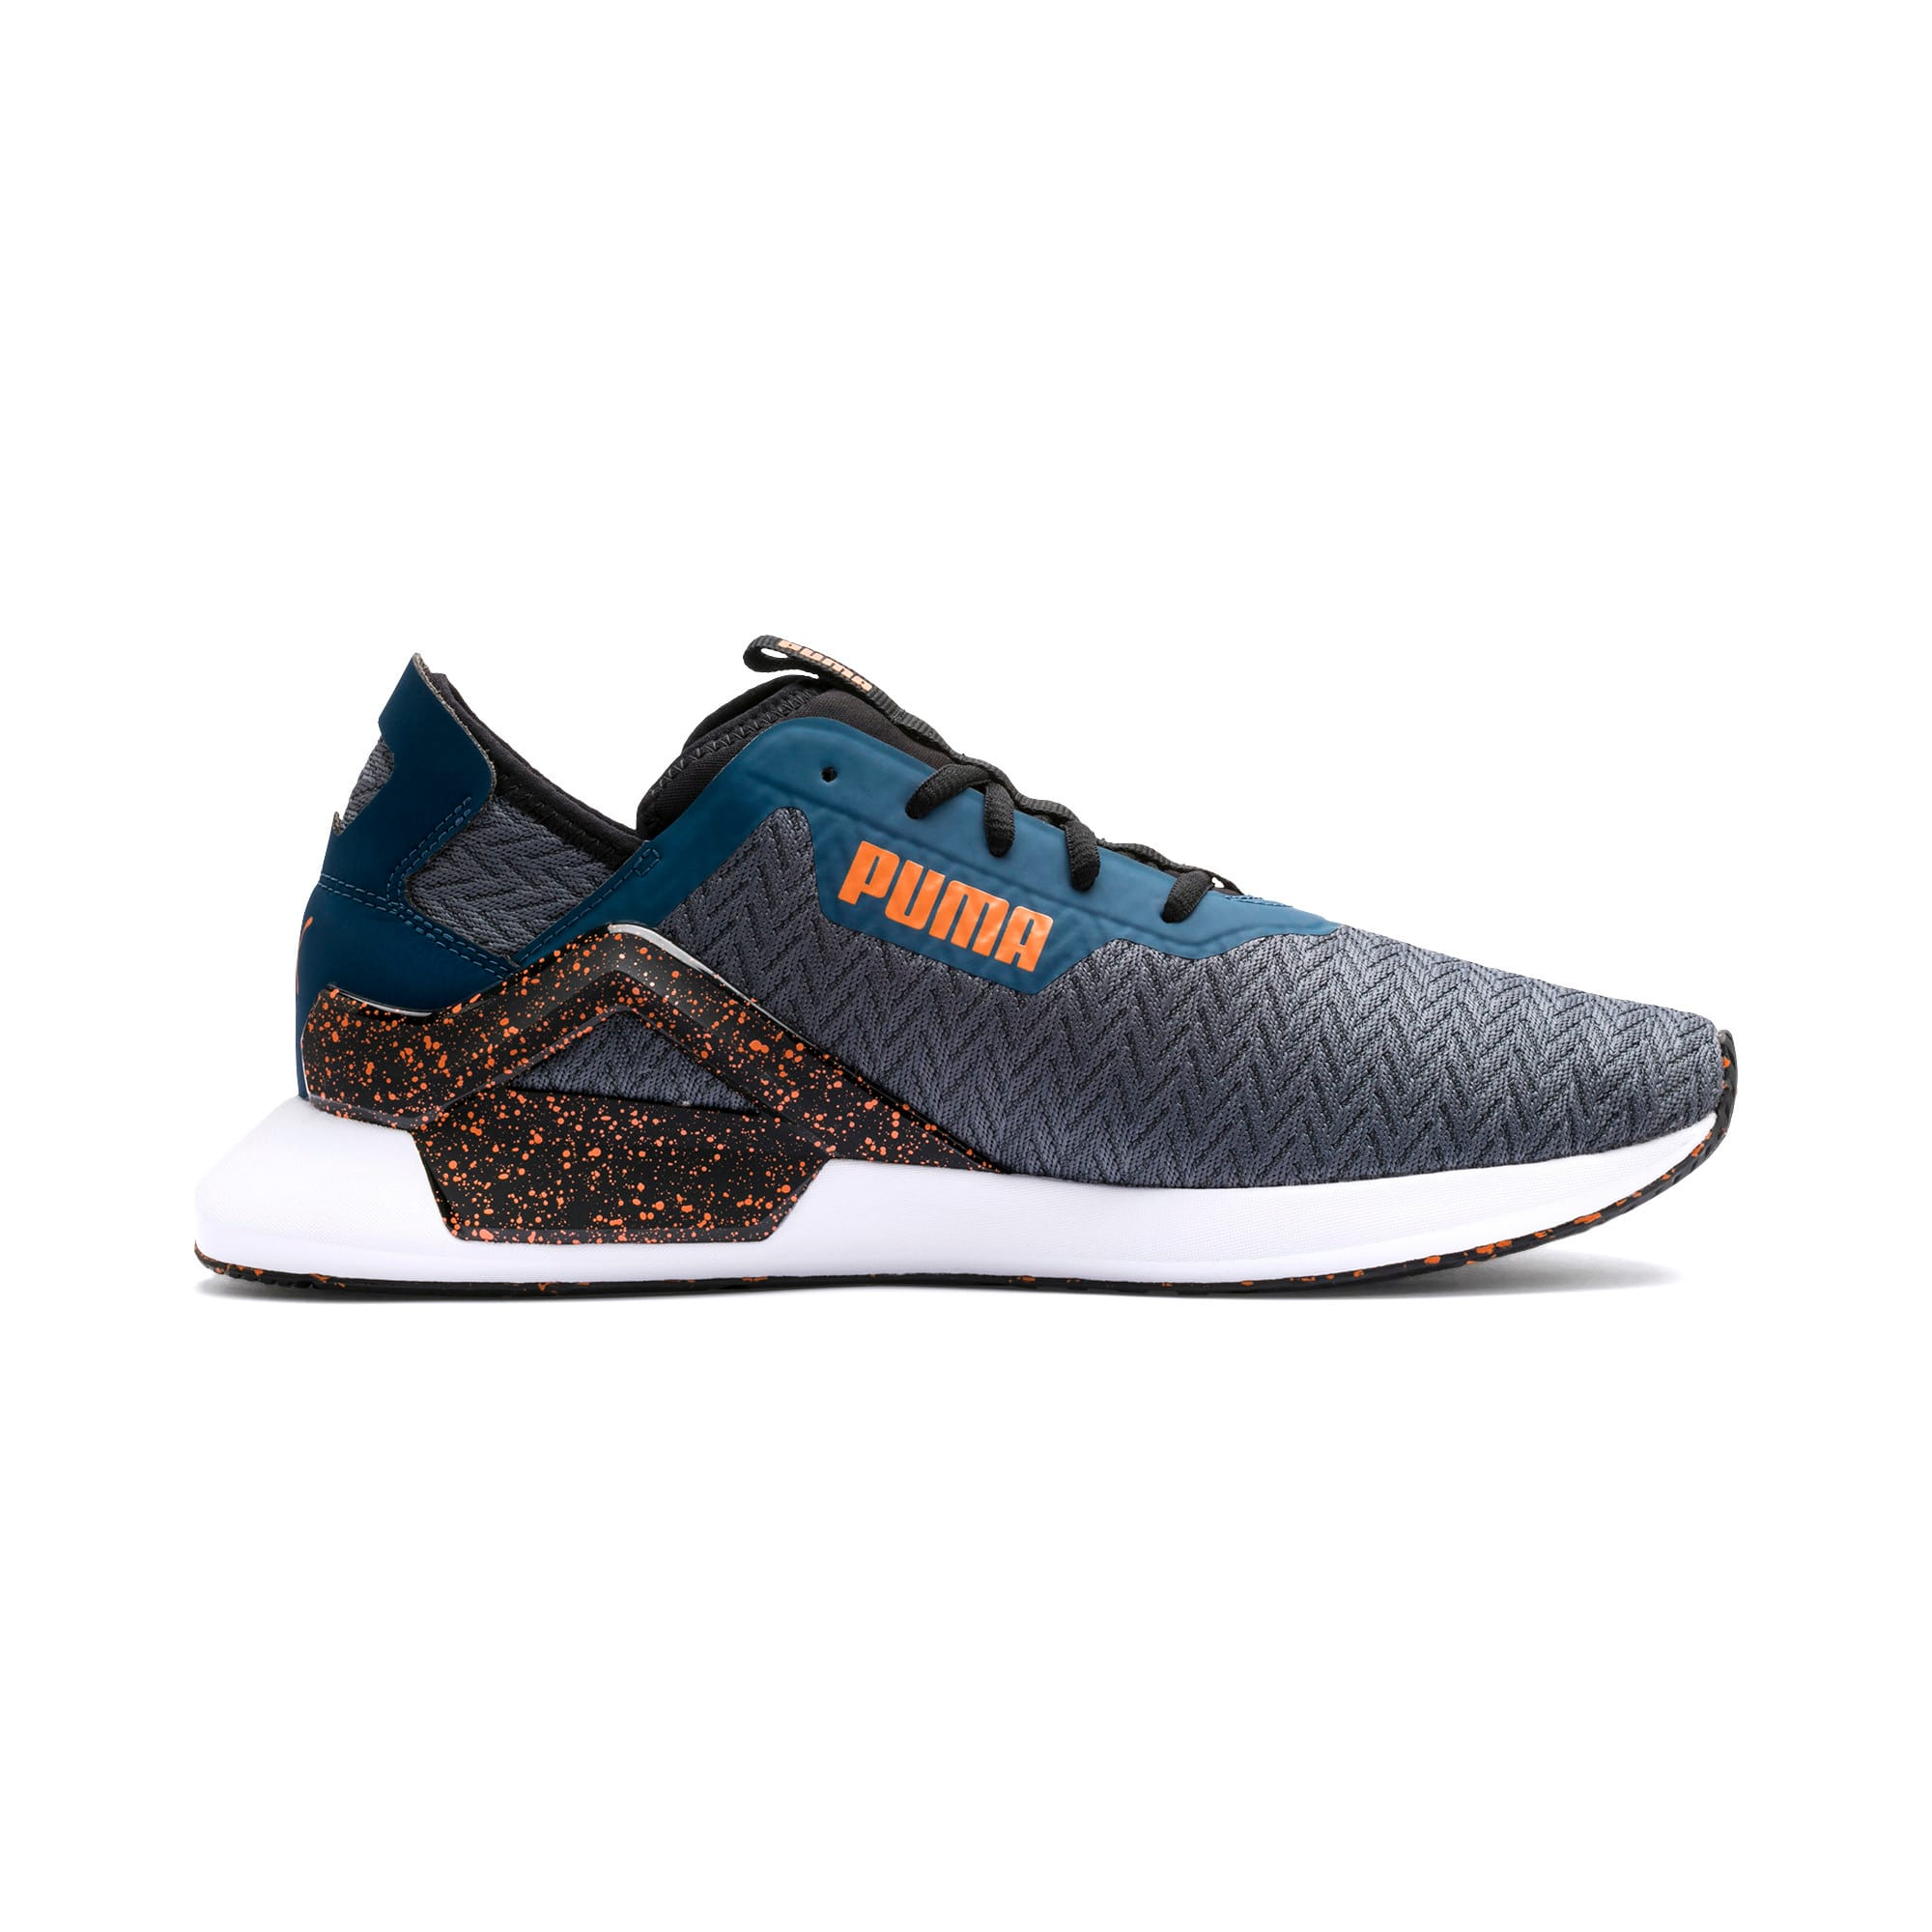 Thumbnail 6 of Rogue X Terrain Men's Training Shoes, CASTLEROCK-Gibr Sea-J Orange, medium